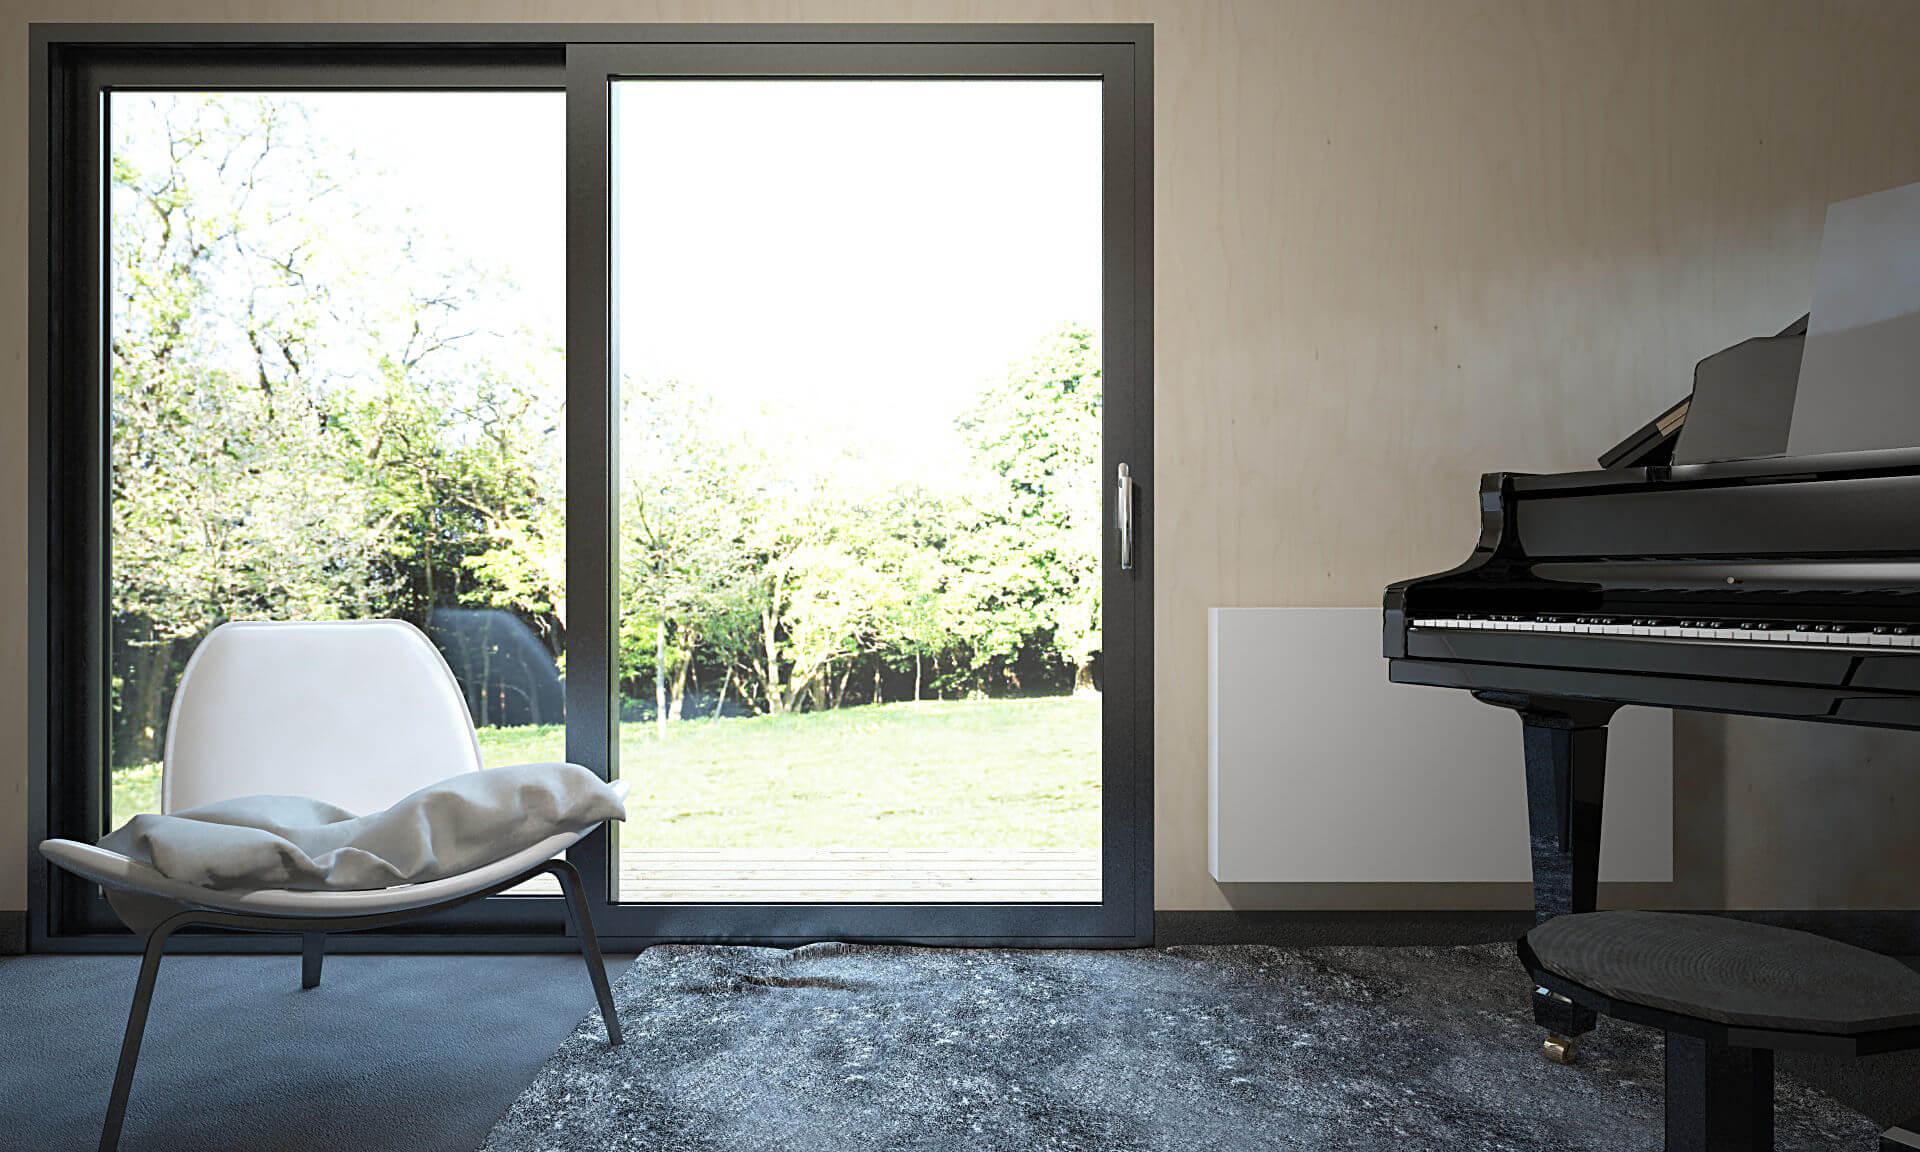 studio de jardin musicien 20m22 - Studio de jardin 20m2